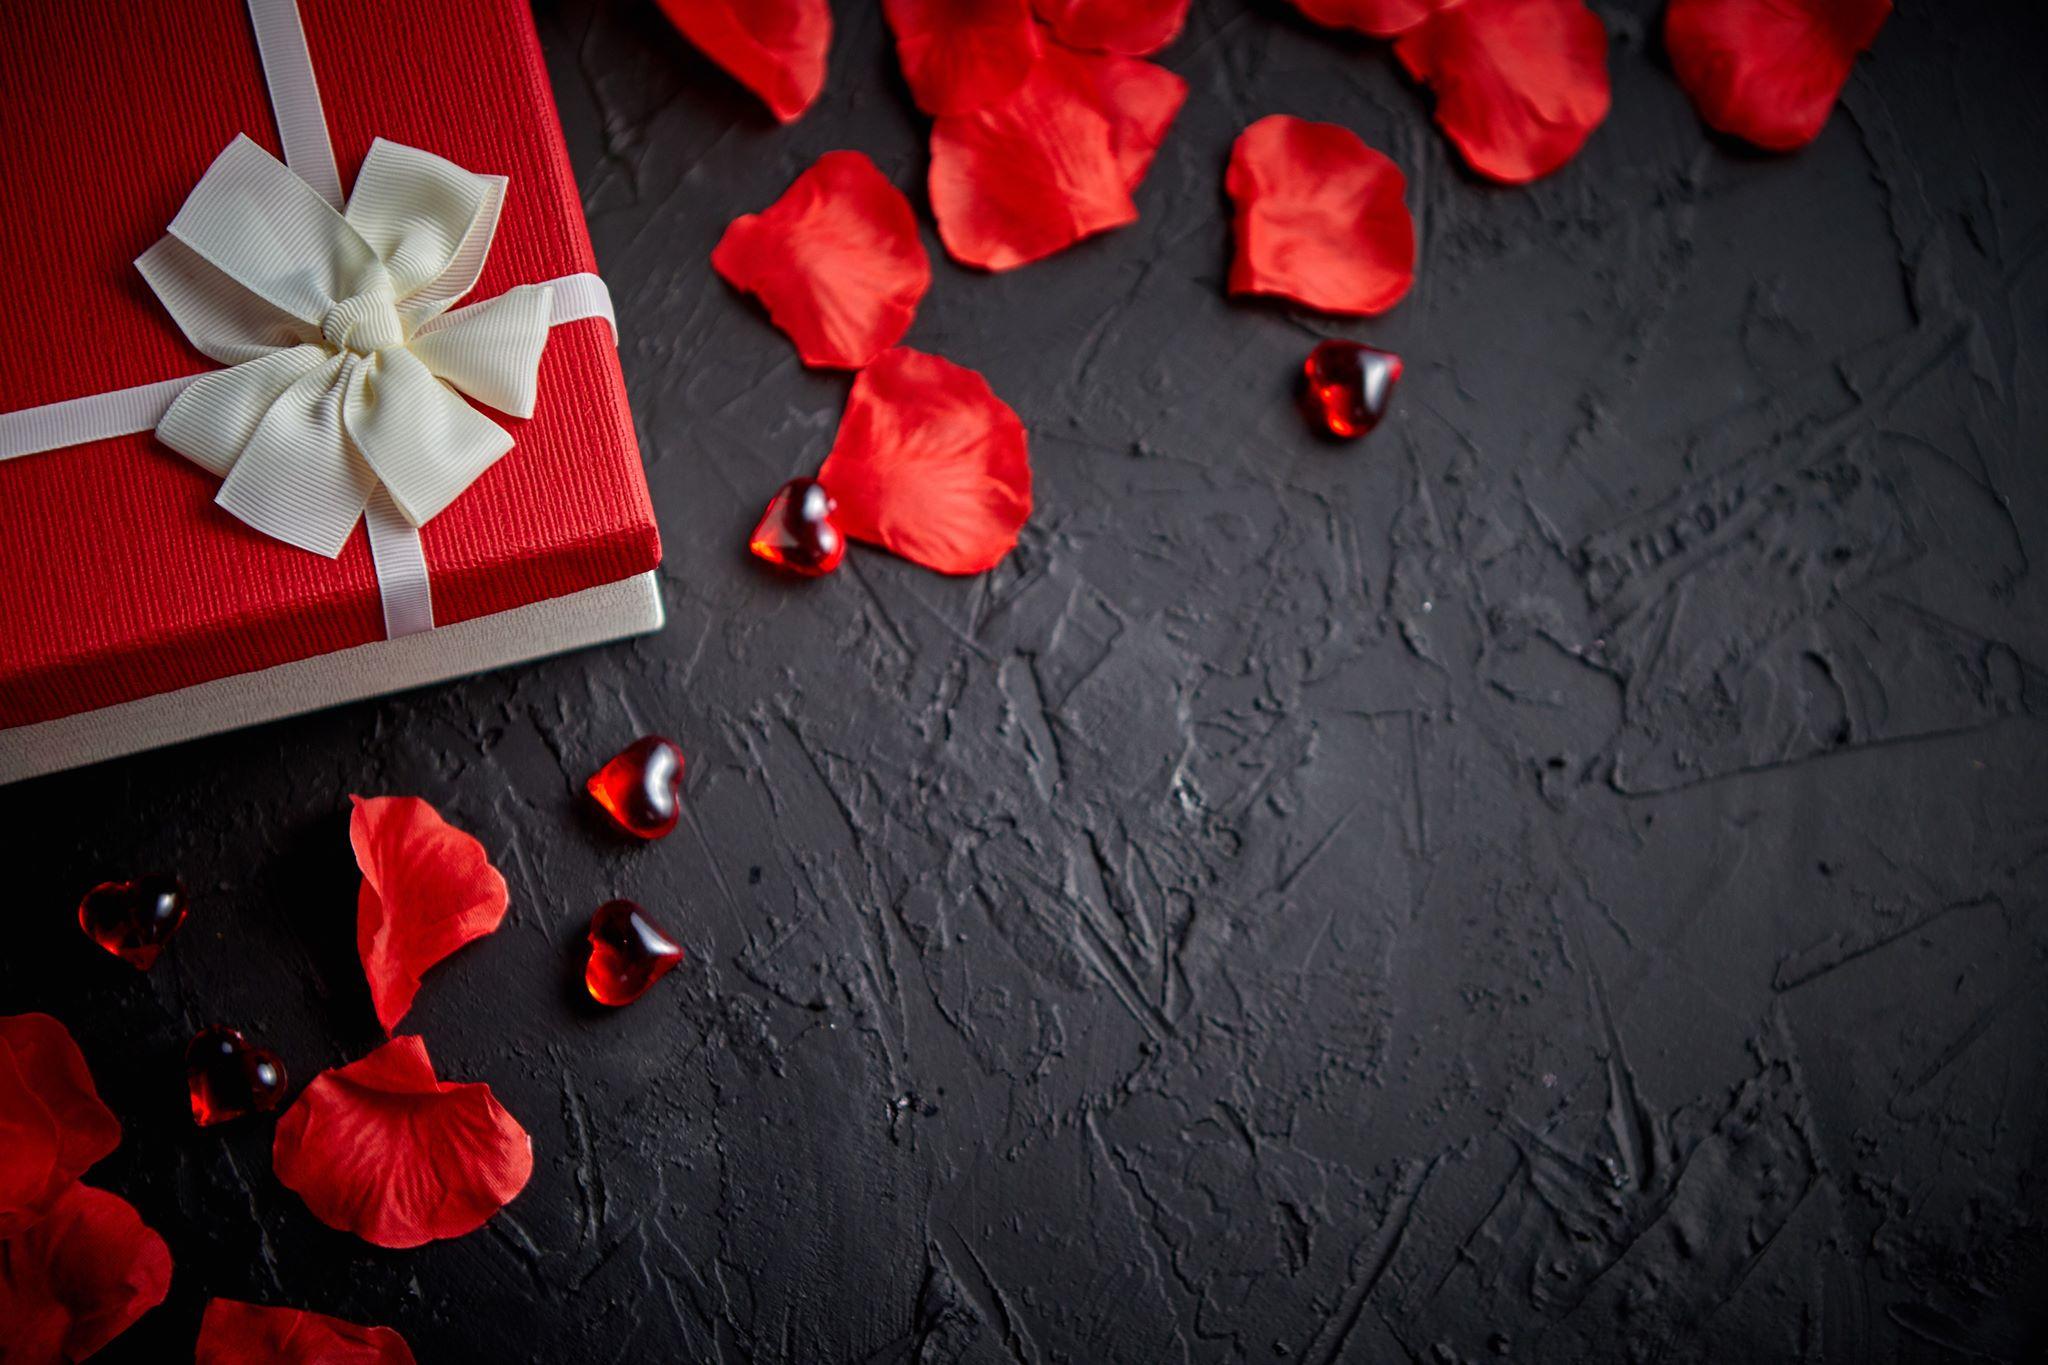 Valentines day images 19 صور عيد الحب